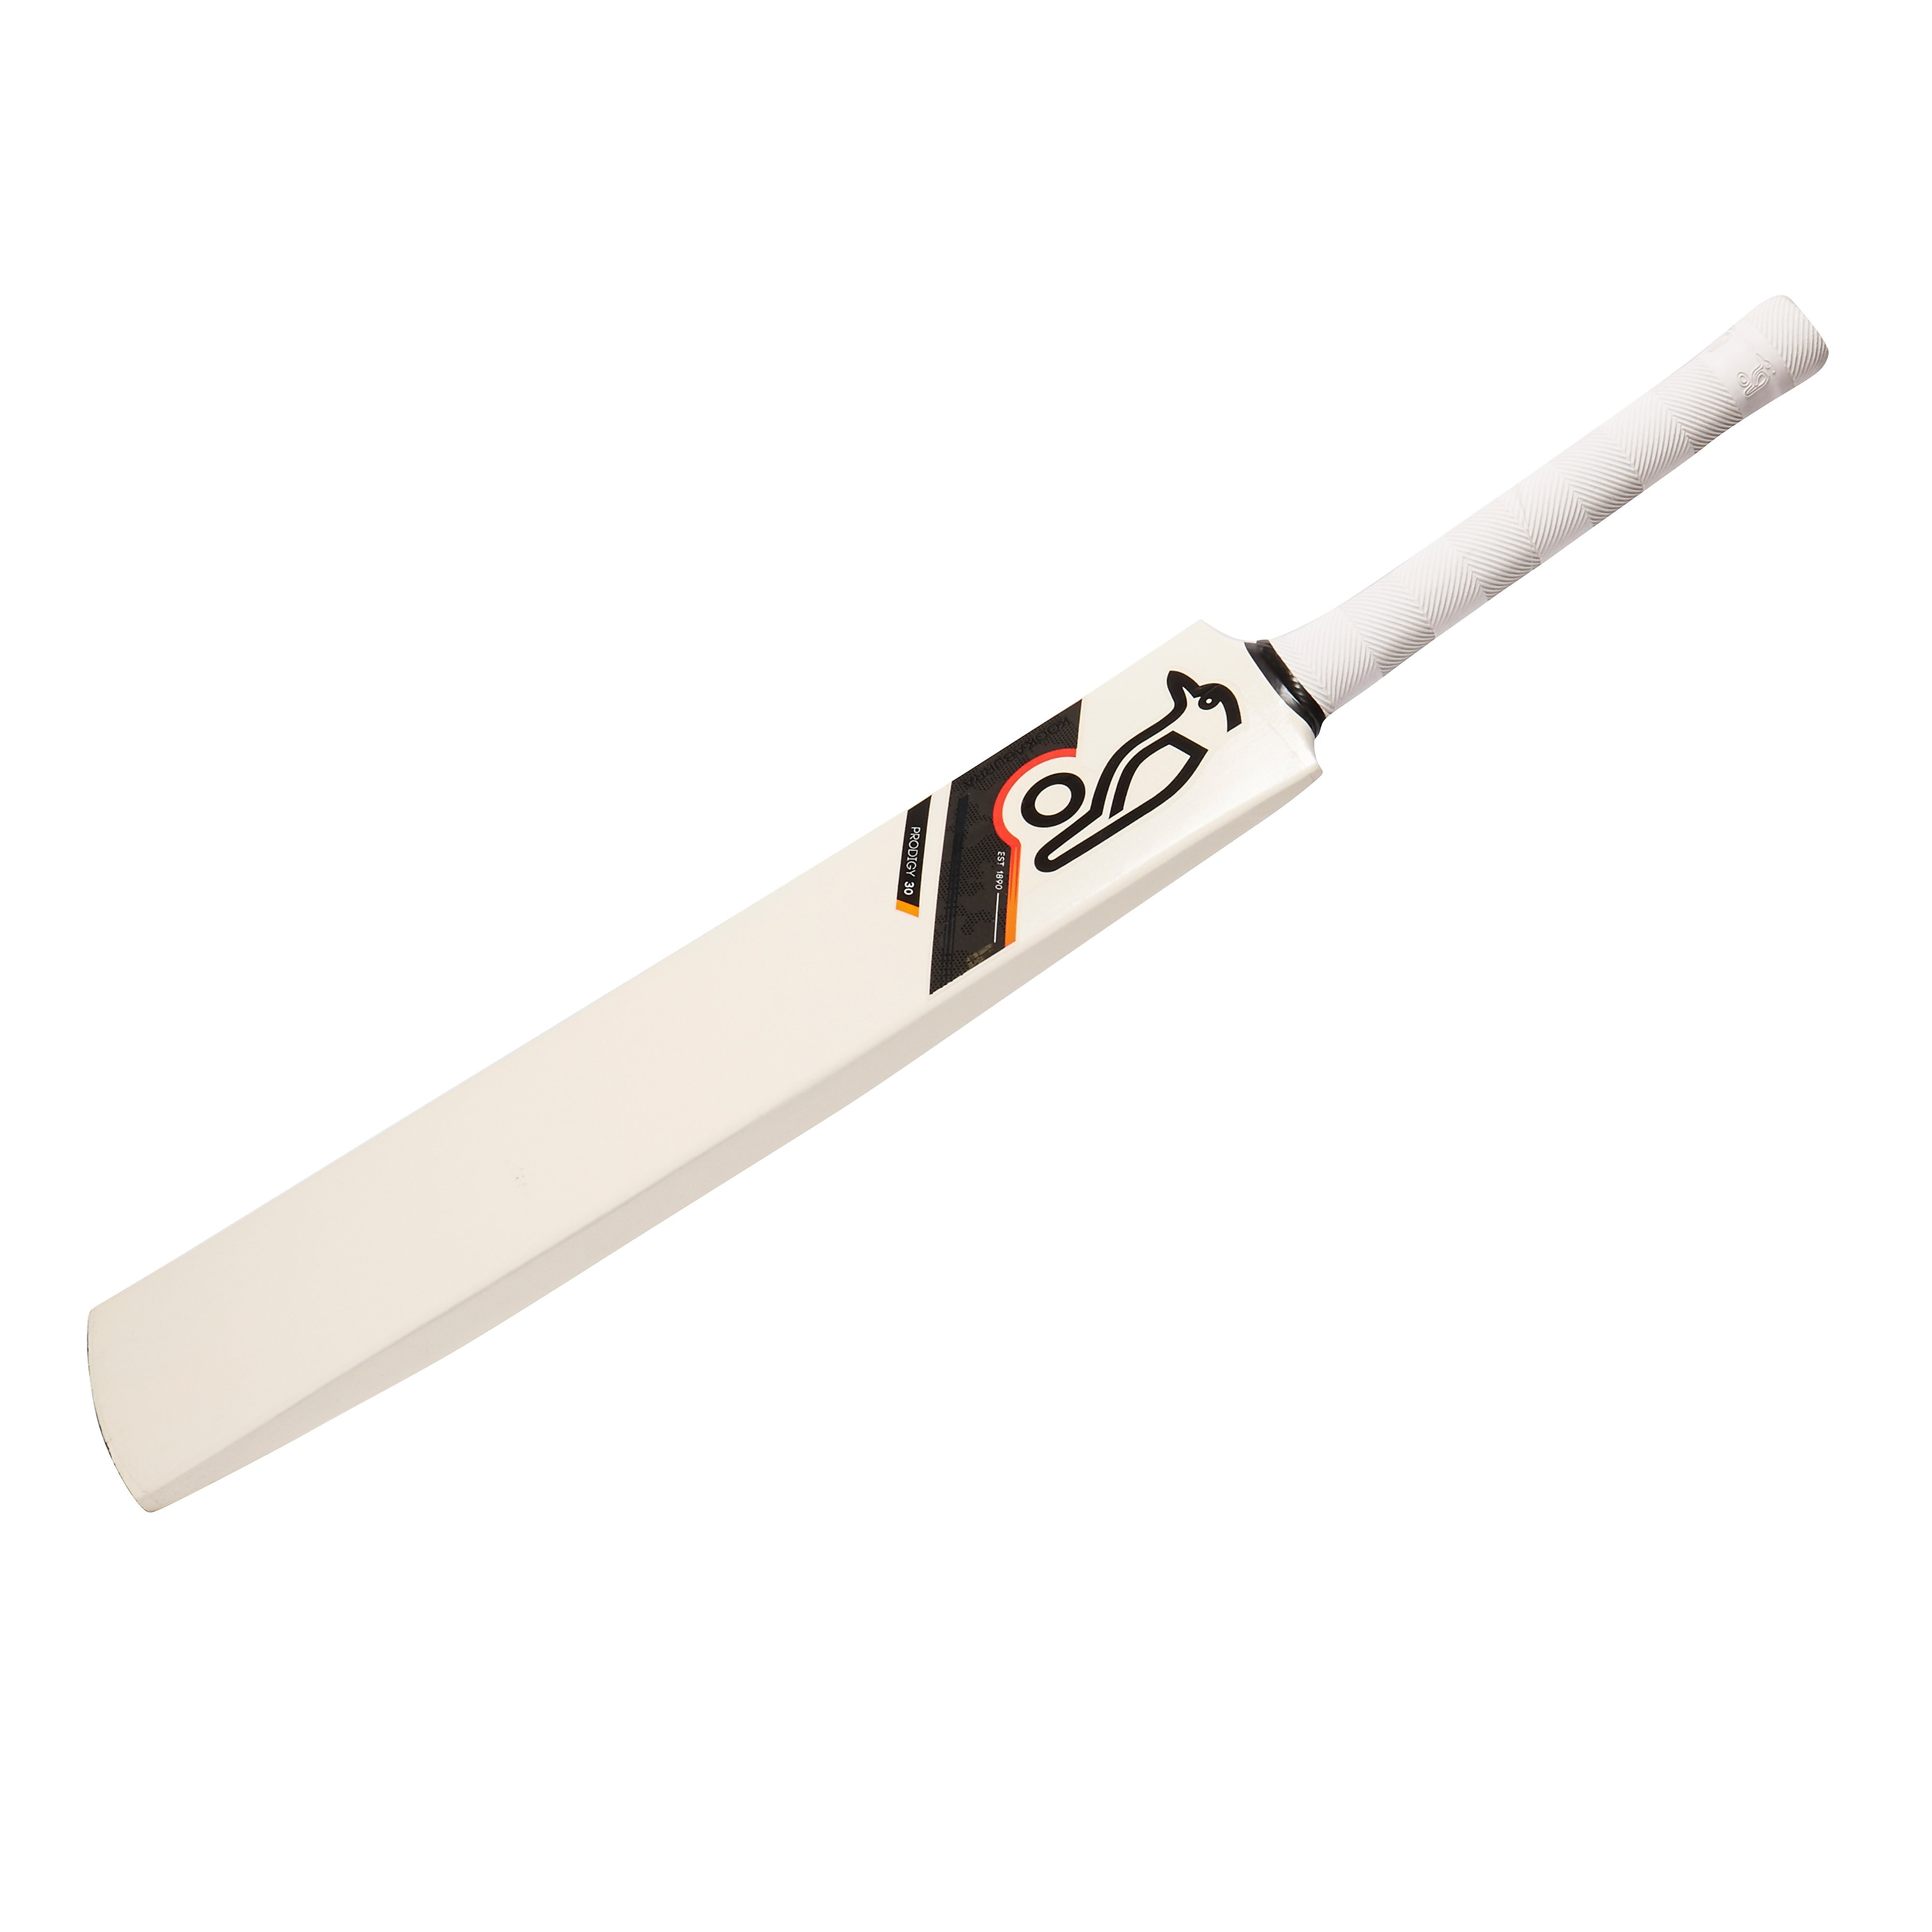 Kookaburra Blaze Prodigy 30 Junior Cricket Bat